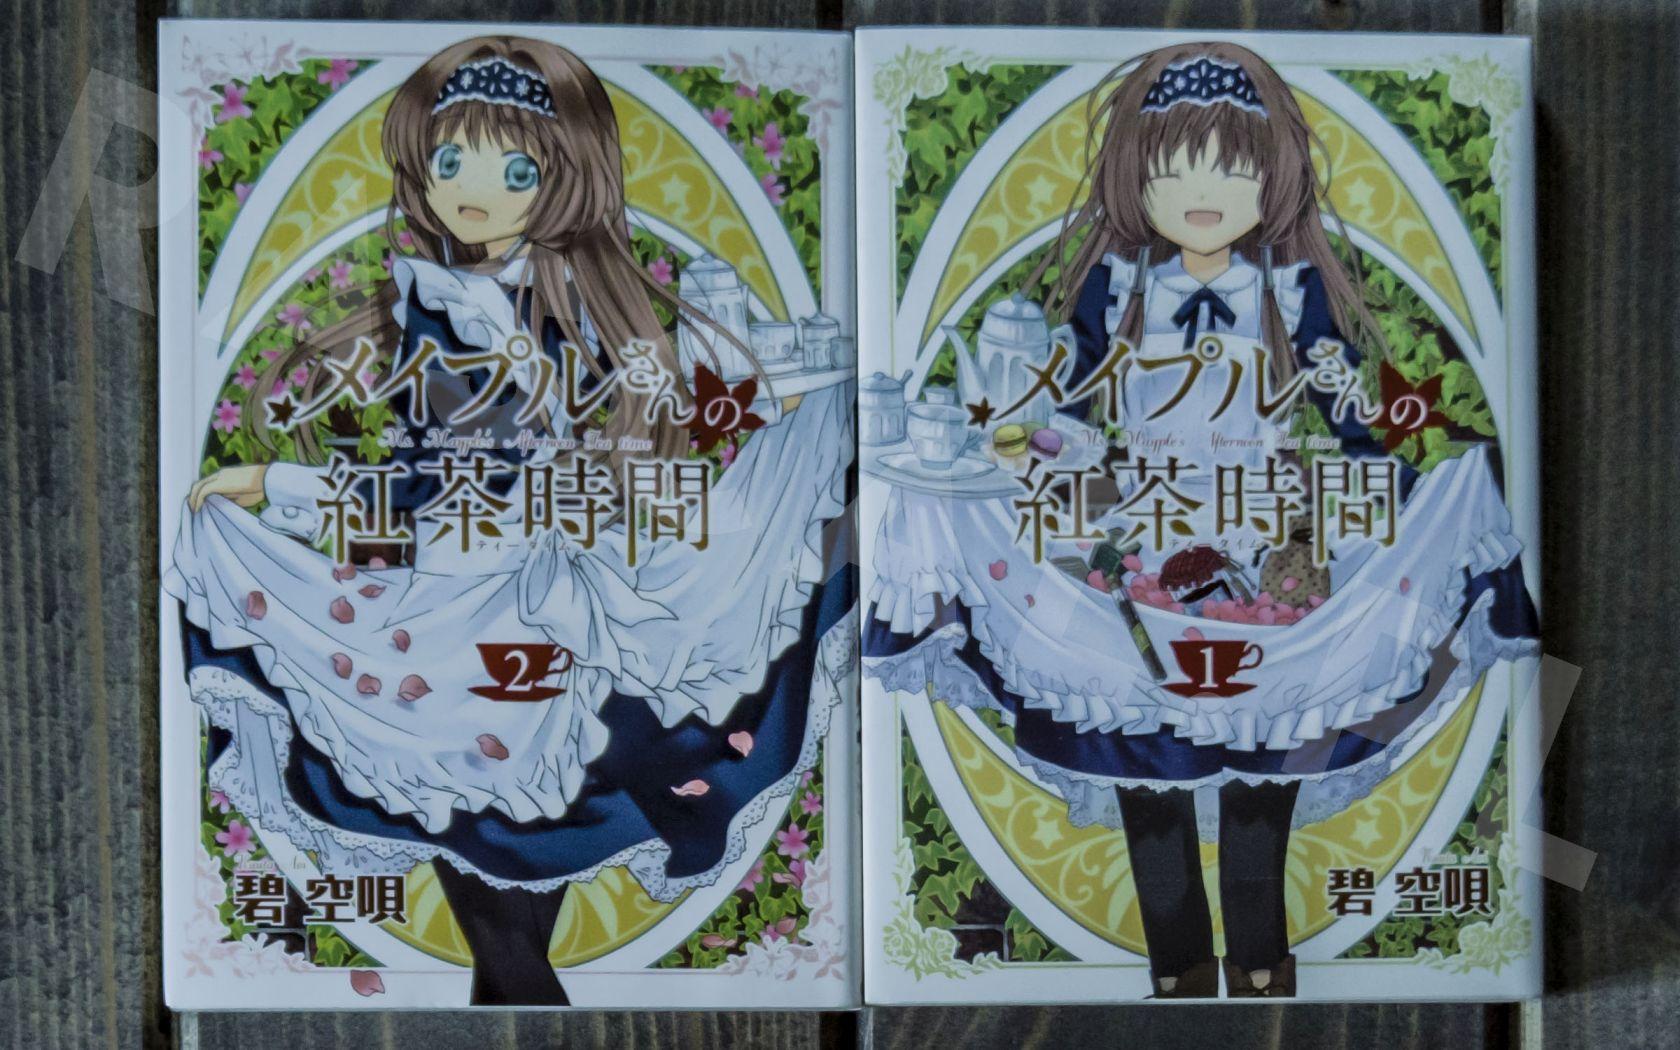 Maple san no Koucha Jikan (1-2) - Mag Garder Comics Eden - Nowości w kolekcji mangi (listopad 2020) - rascal.pl